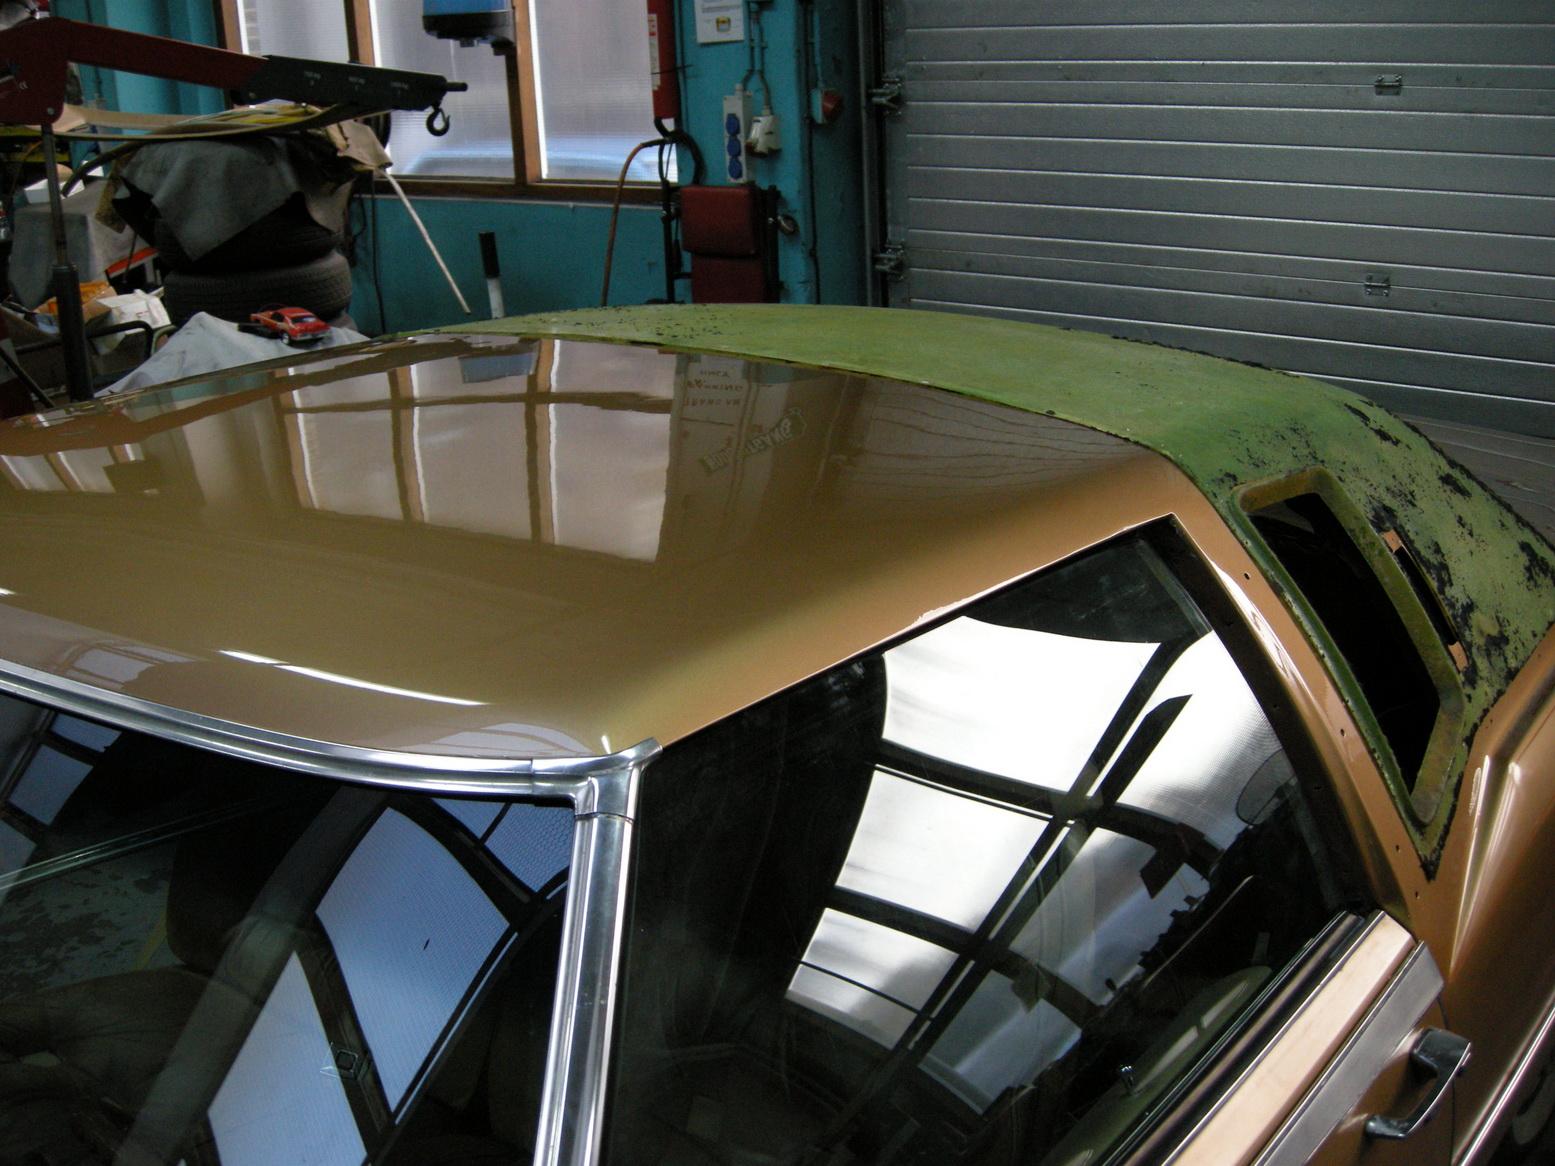 20101209 1977 cadillac eldorado biarritz roof nearly done 06